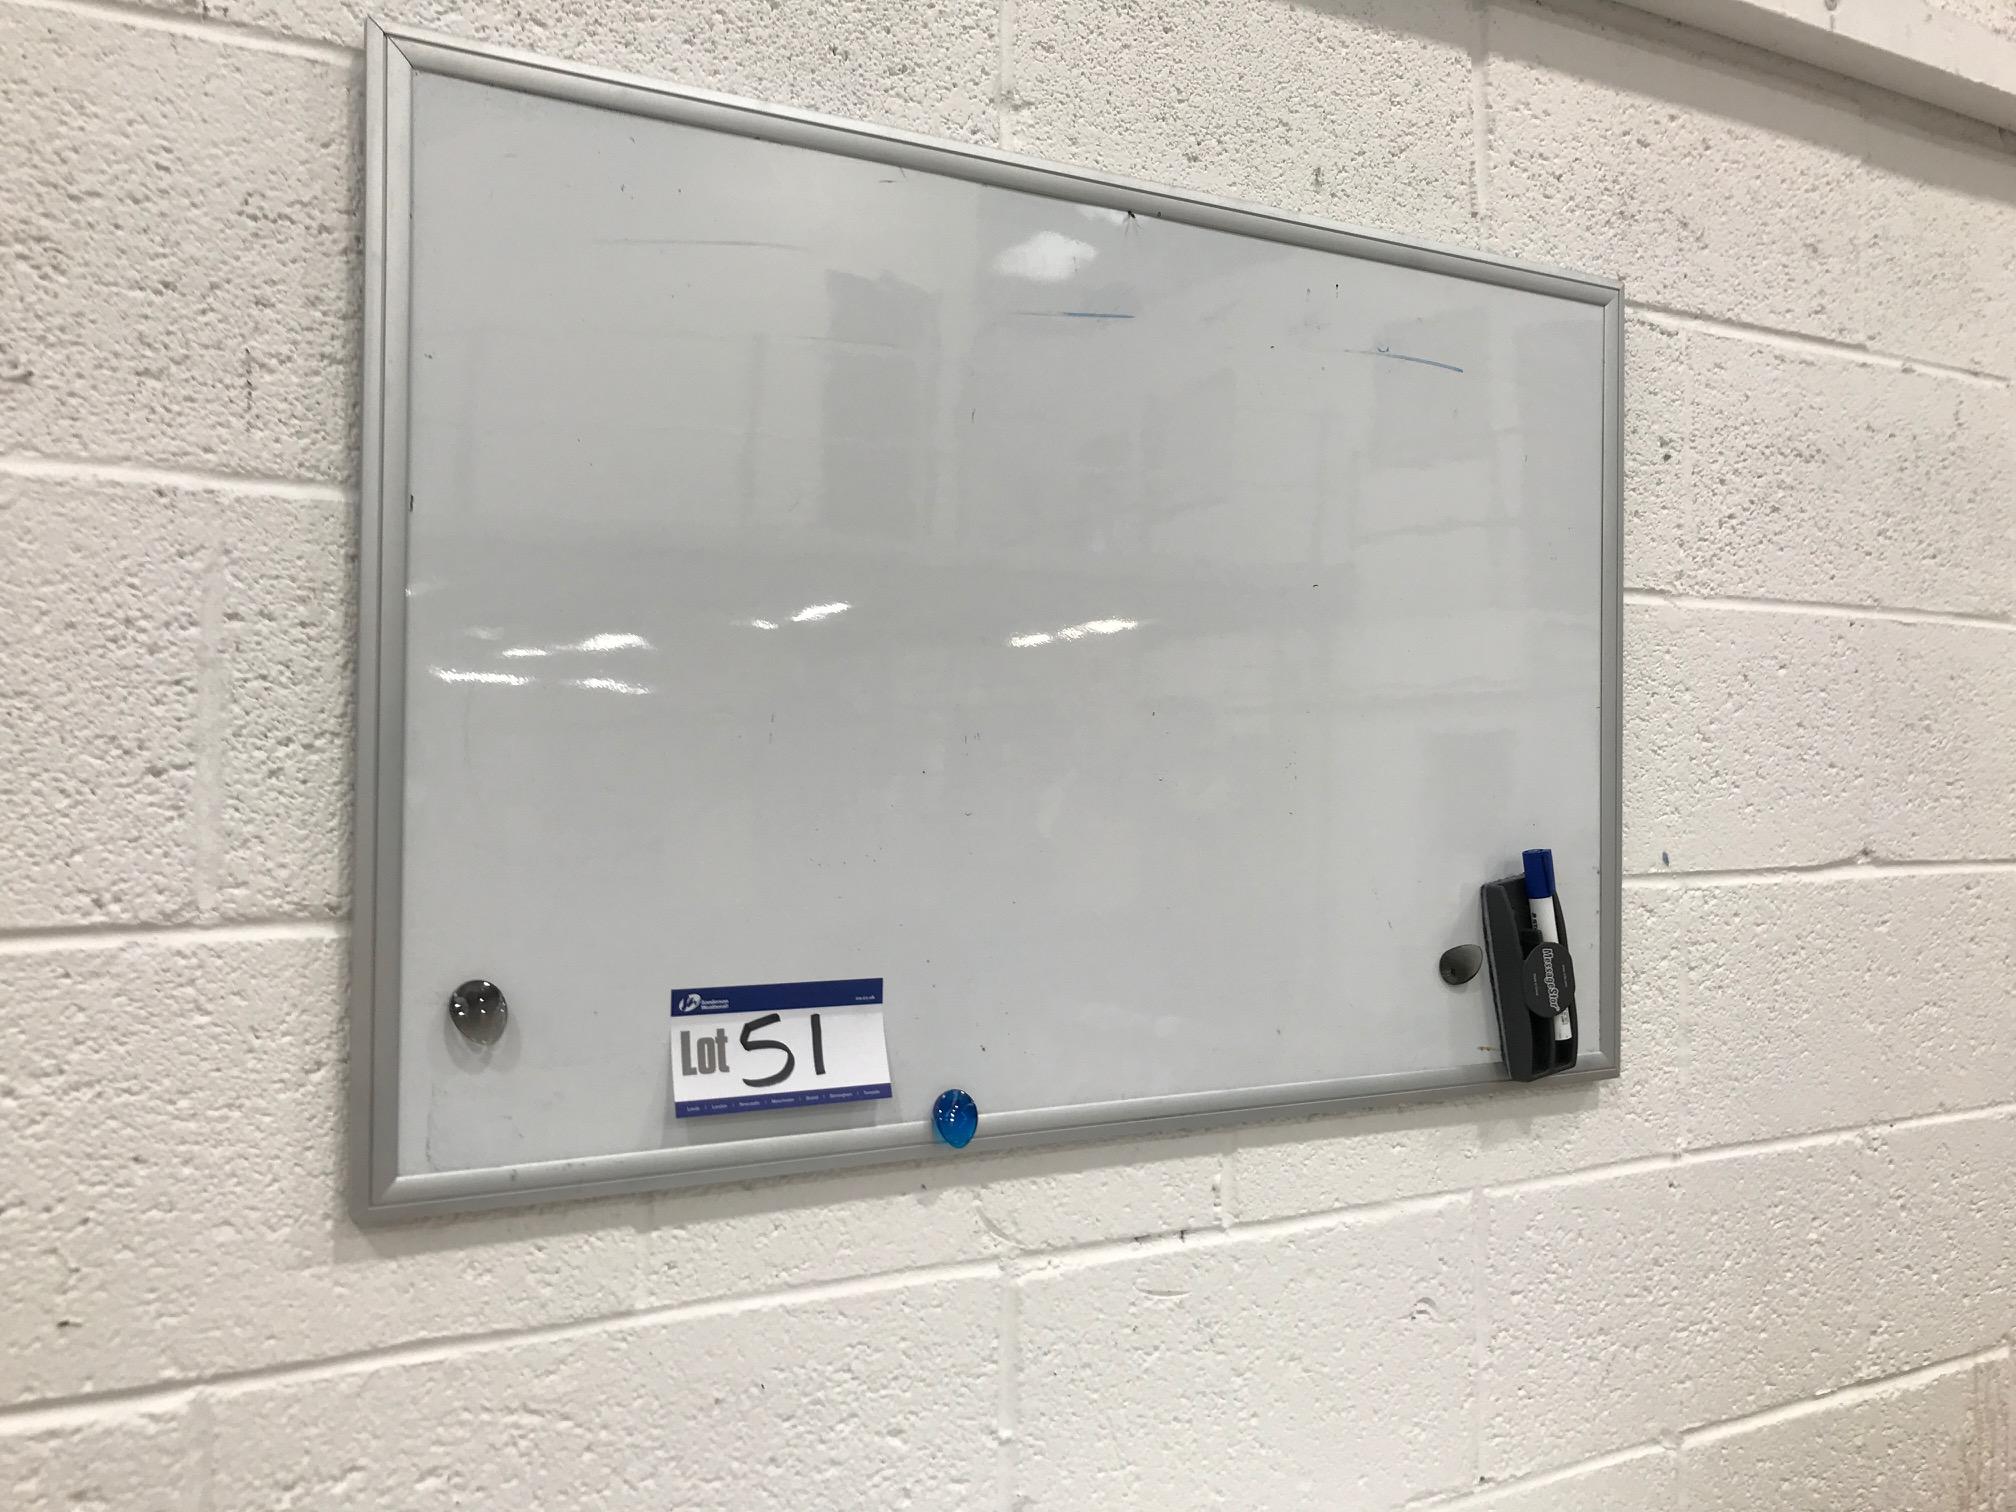 Lotto 51 - Two Wipe Clean White Boards